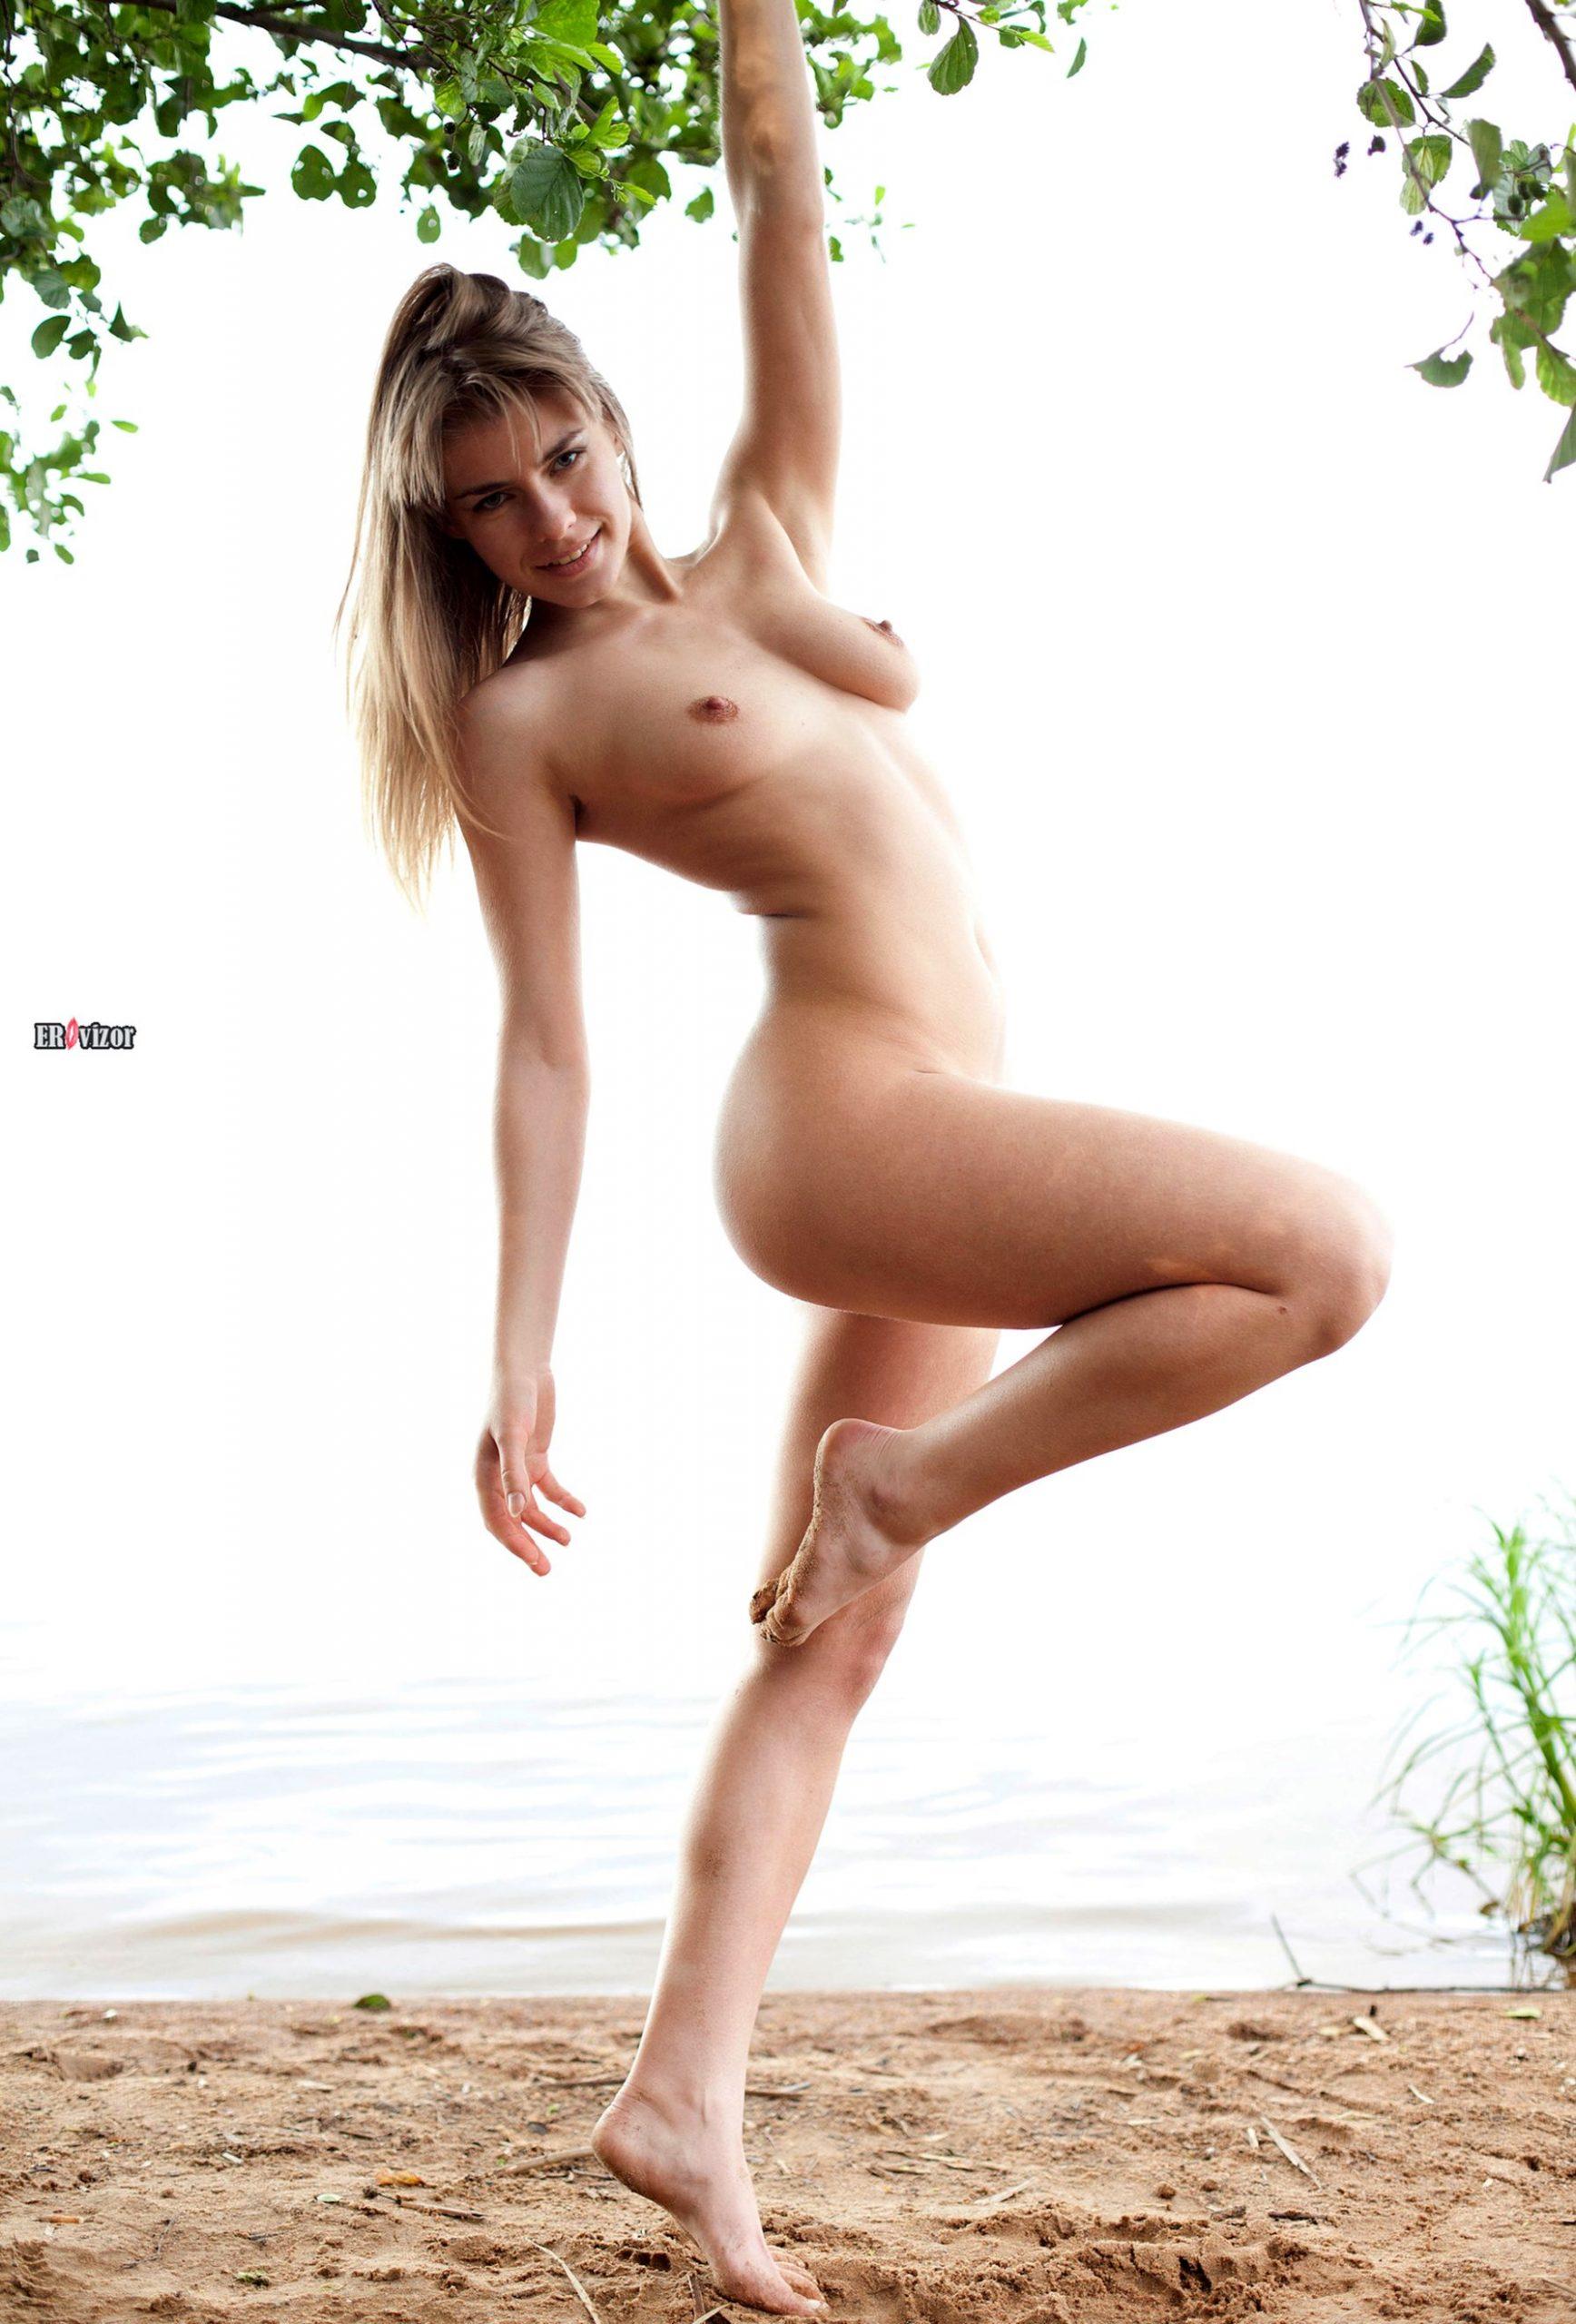 adele_naked_acrobatic-erovizor-2